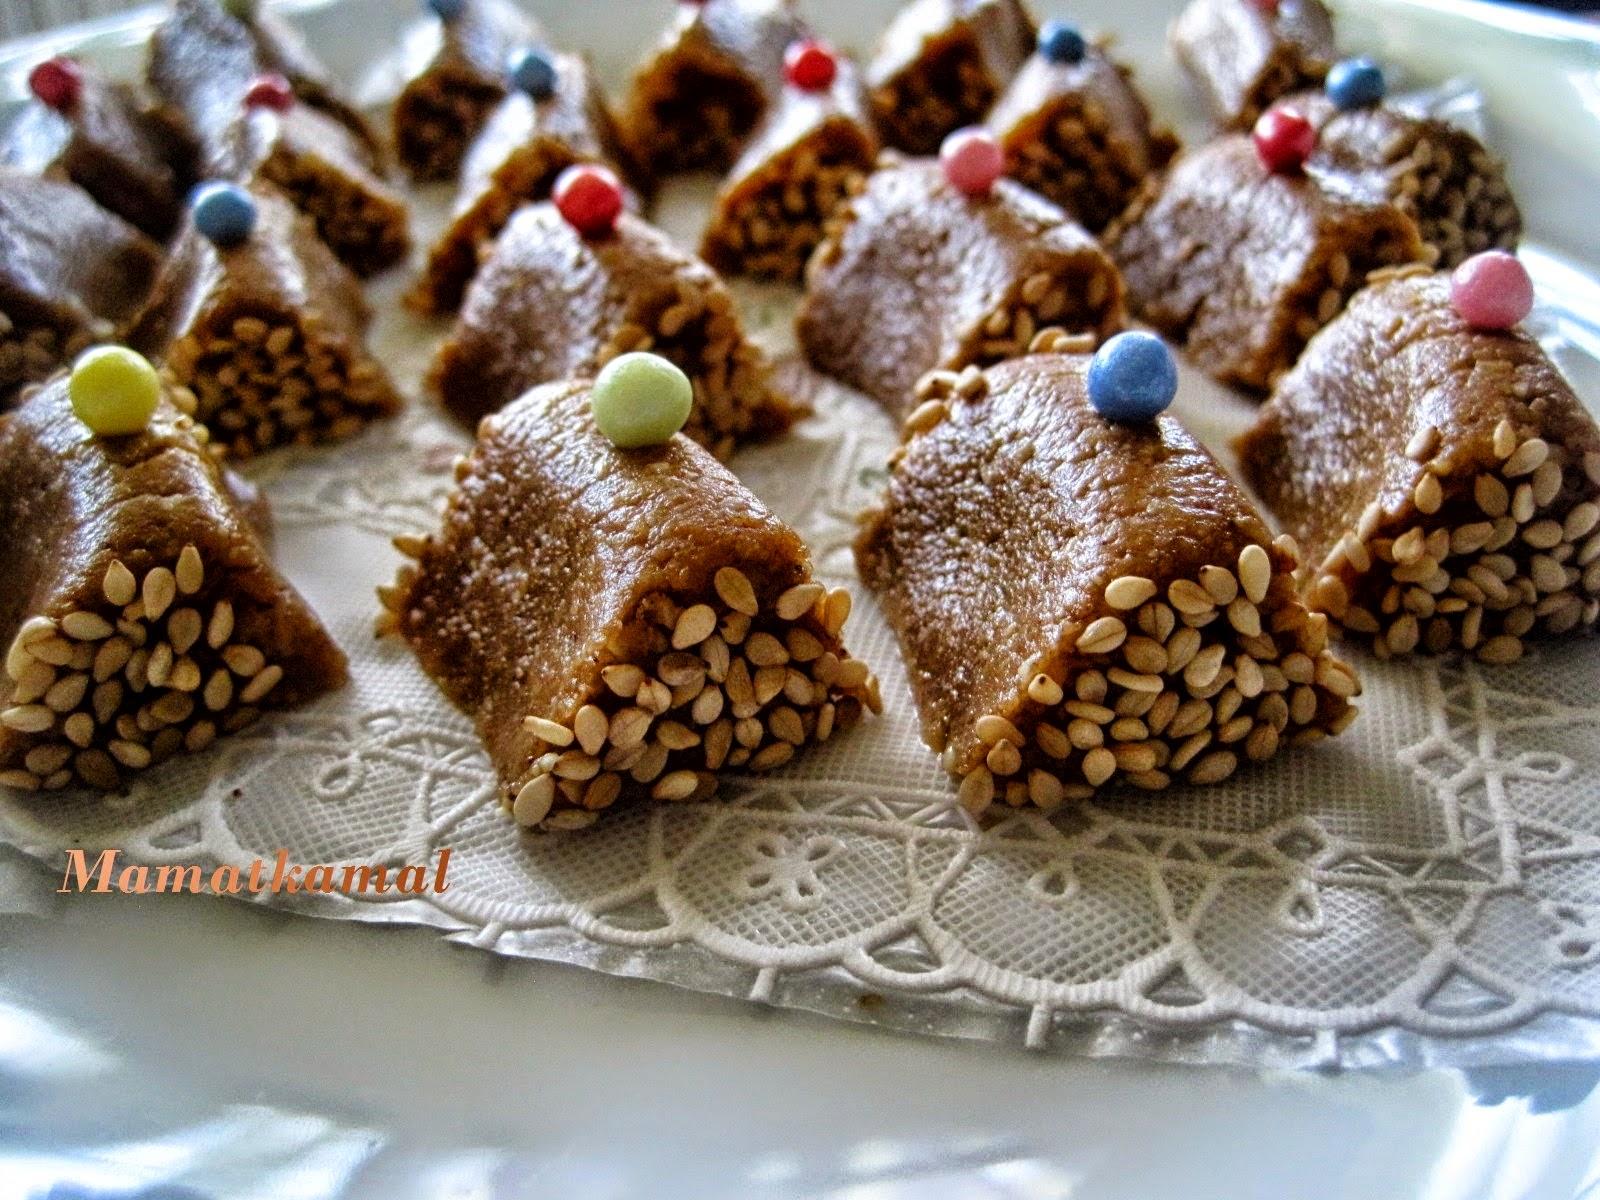 Moroccan Cuisine Marocaine: تقاوت/سْلّو/سْلِيلُو/سْفُوفْ/زمّيطة ...